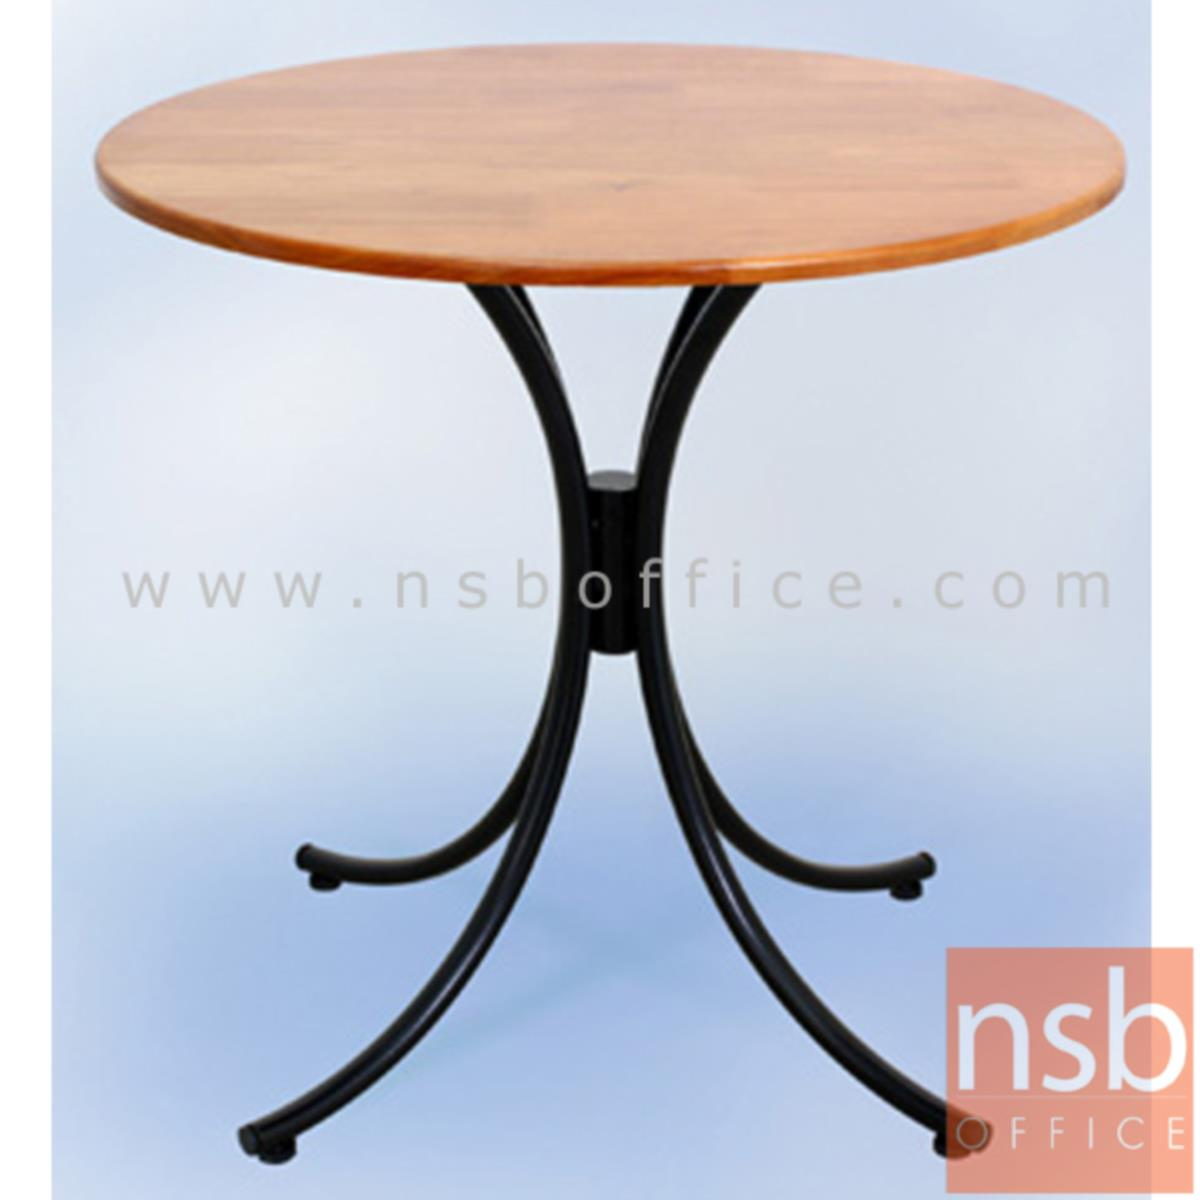 A14A004:โต๊ะหน้าไม้ยางพารา รุ่น Corrado (คอร์ราโด) ขนาด 60Di ,75Di cm. ขาเหล็ก